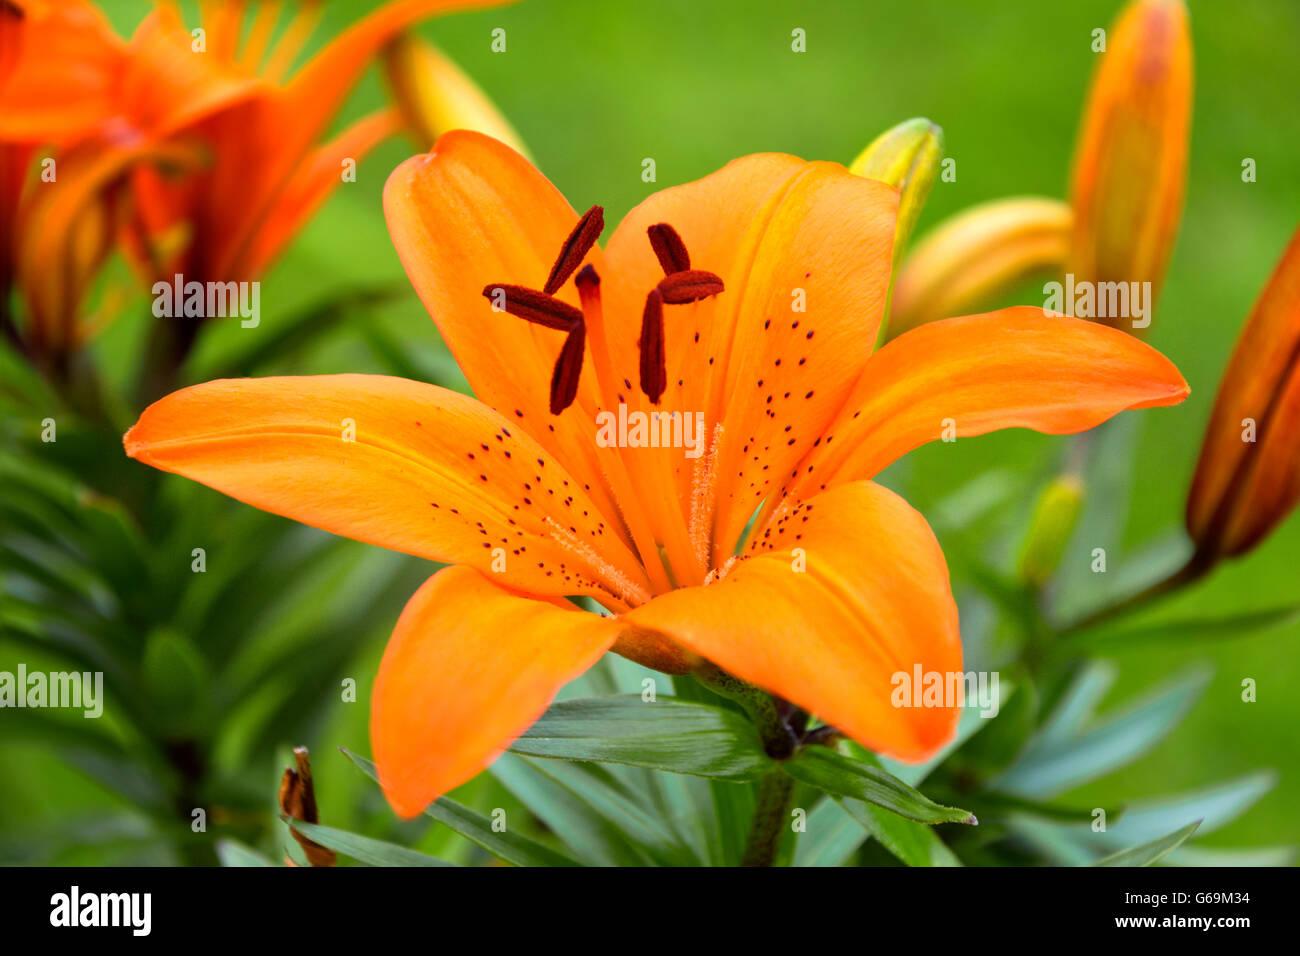 Orange Flower With Black Spots Stock Photos Orange Flower With